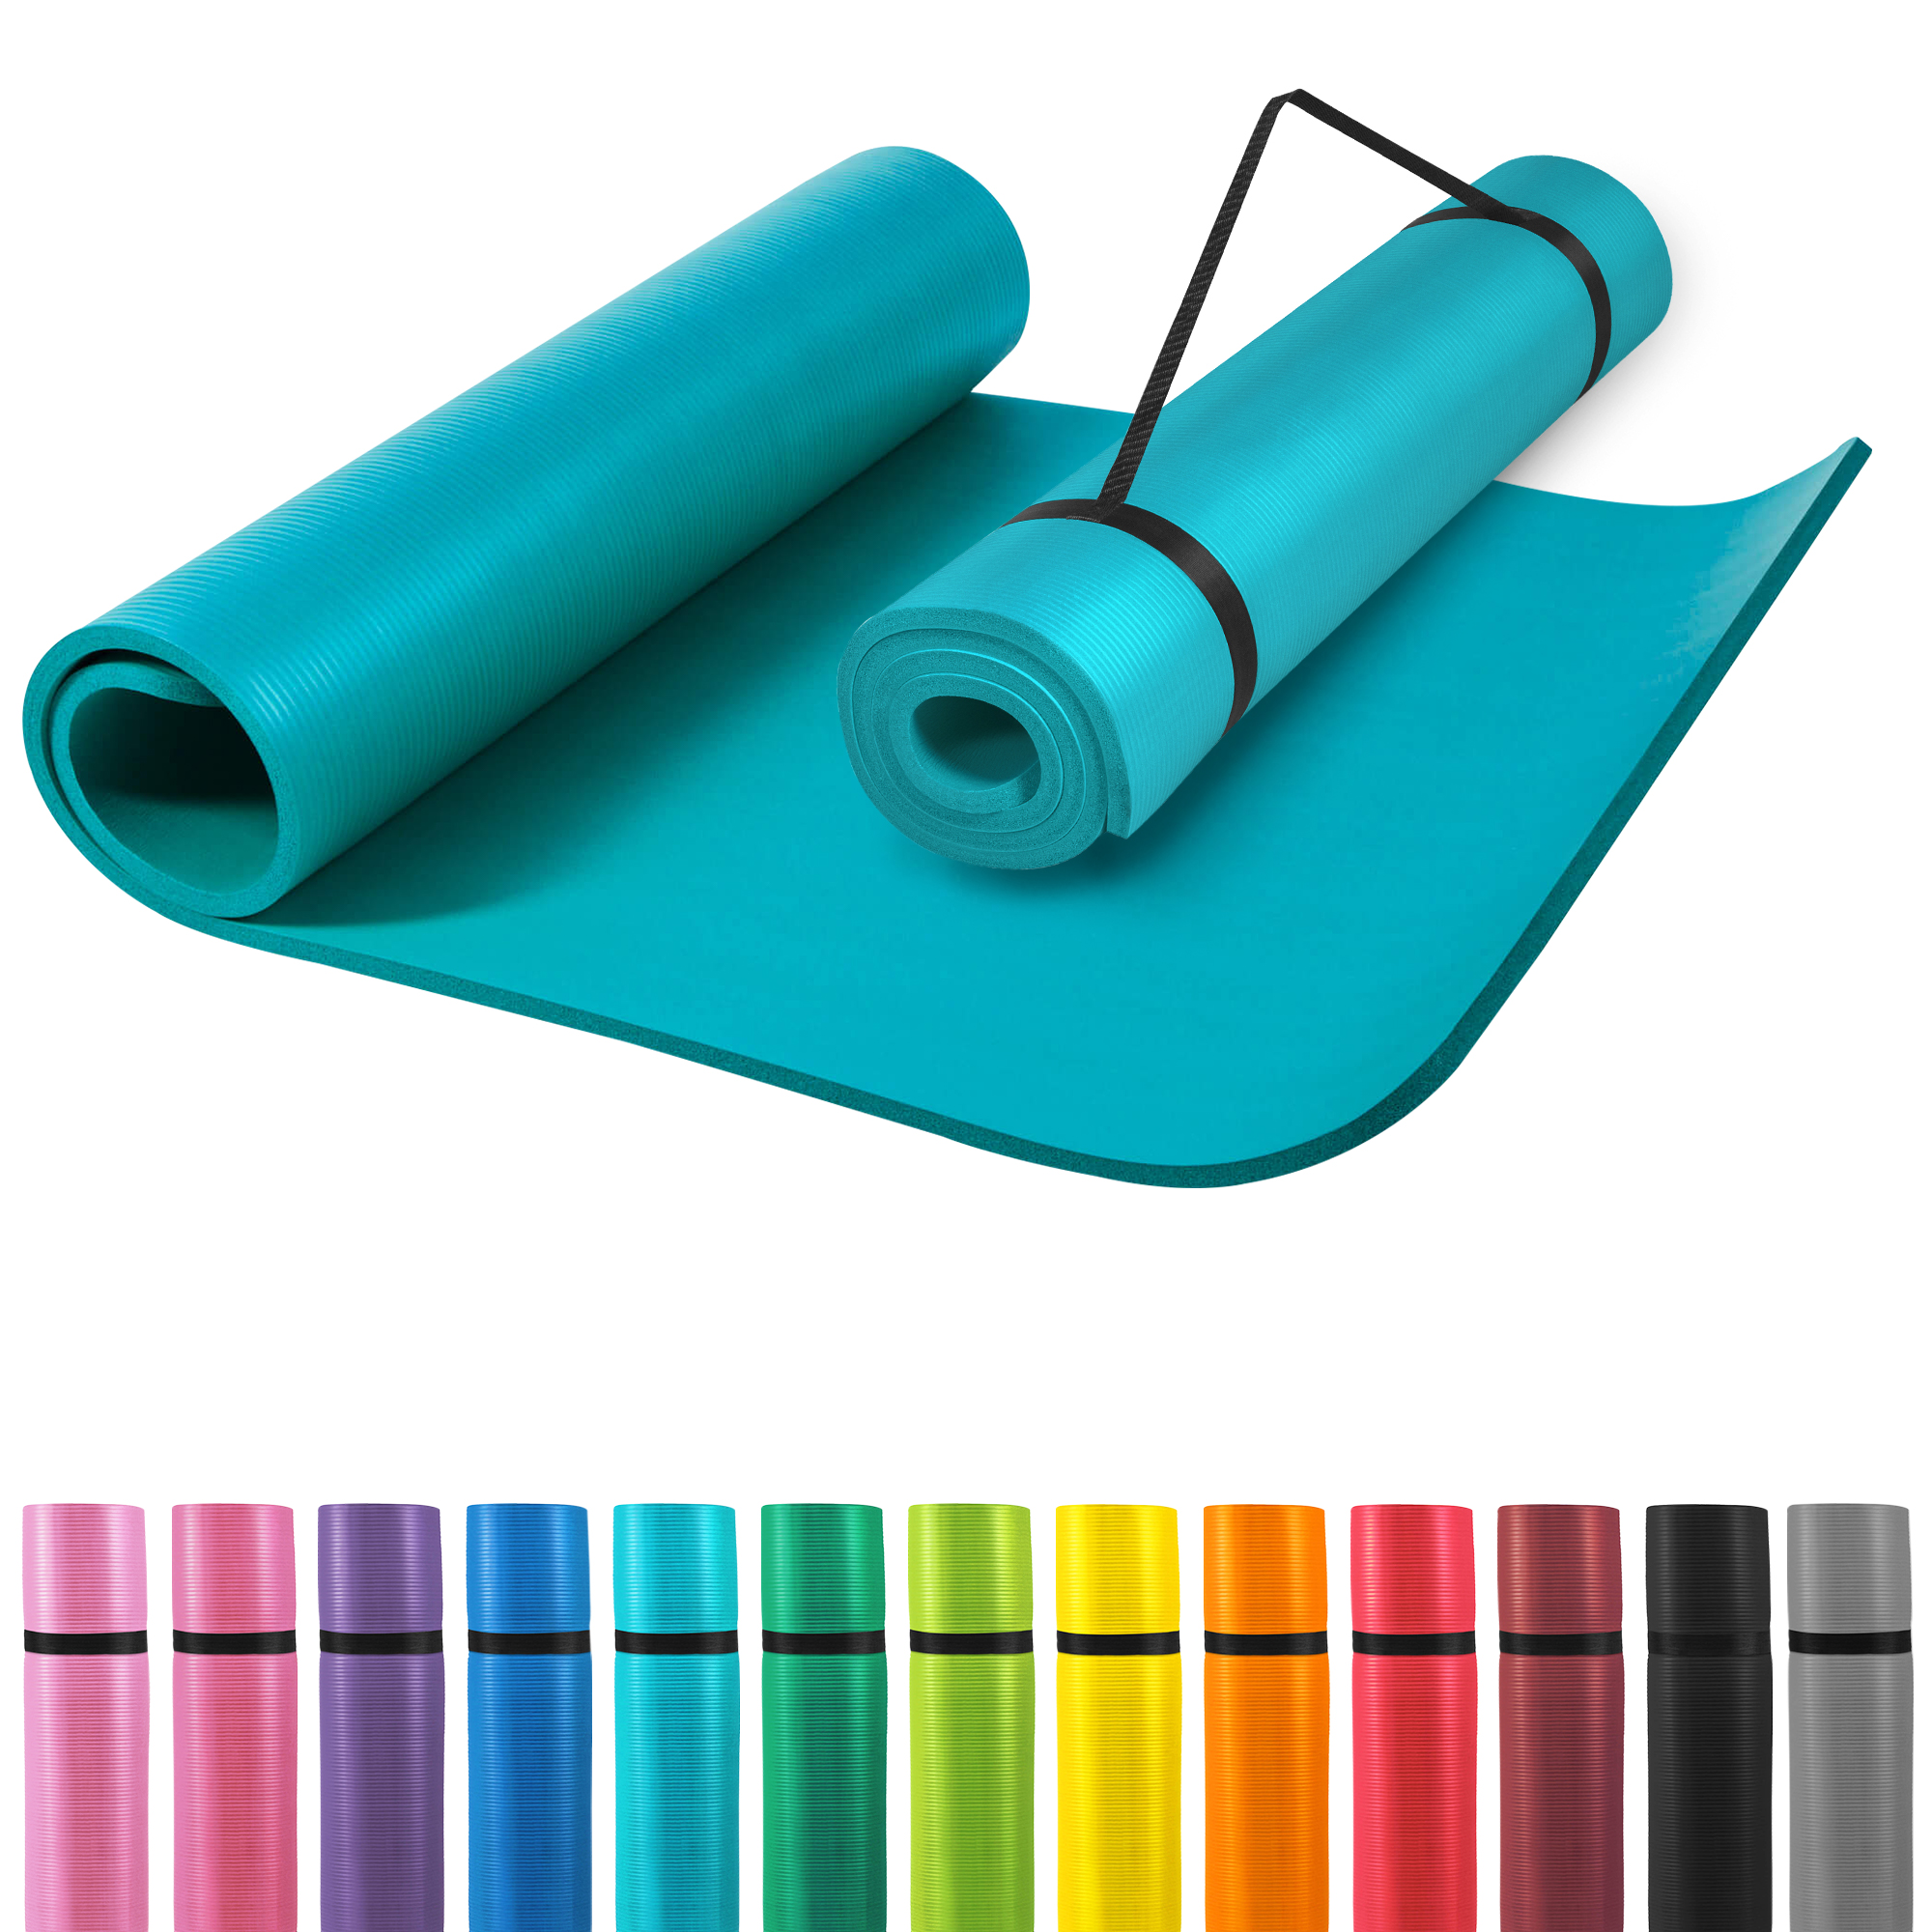 Gorilla Sports Yogamatte Blau 190 x 100 x 1,5 cm 100524-00030-0134